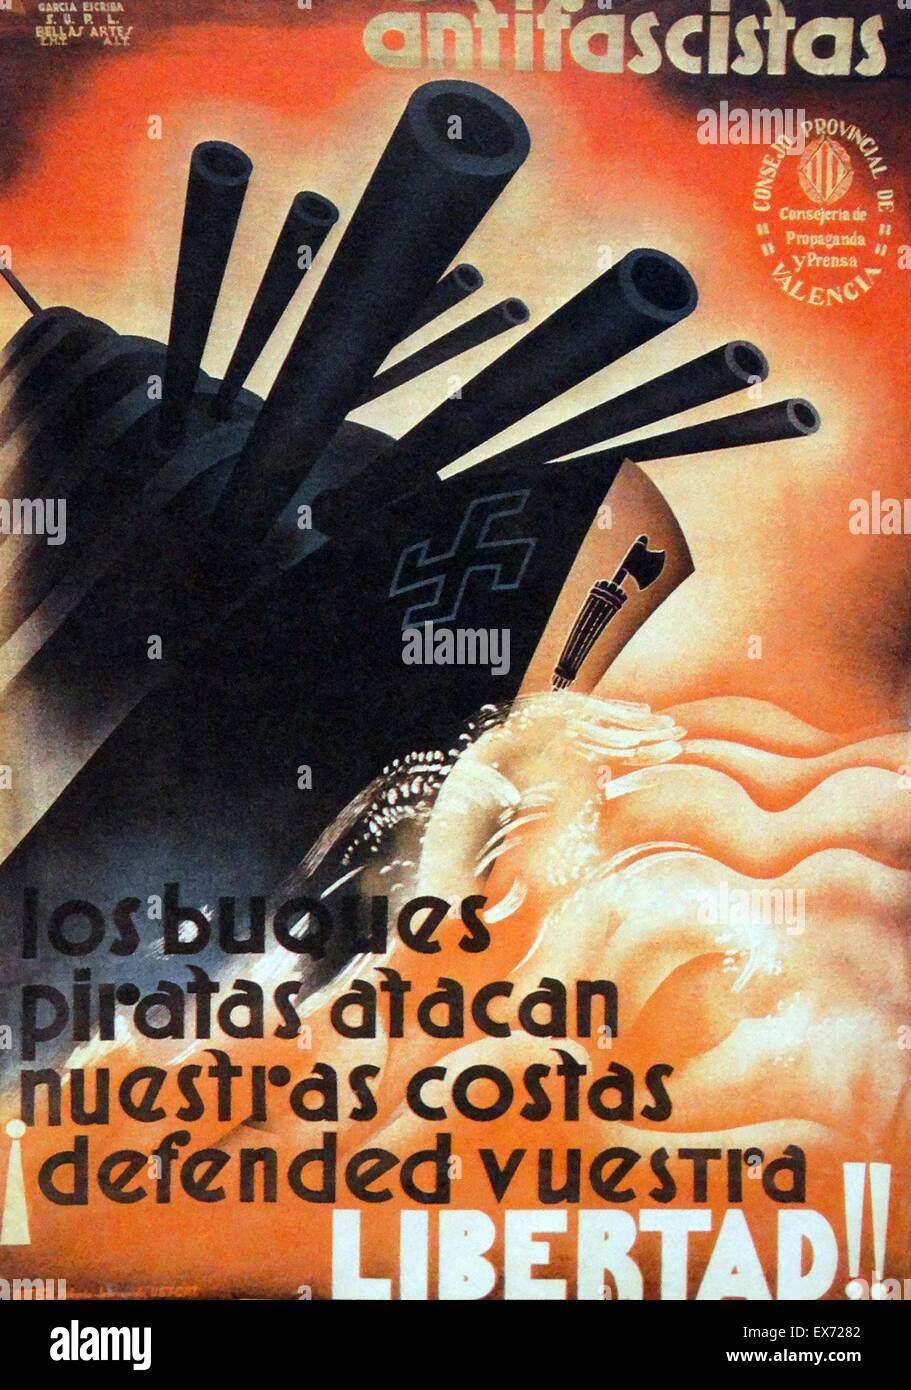 Spanish Civil War Poster; Antifascists against Pirate Ships. Antifascistas contra buque. The Italian and German - Stock Image